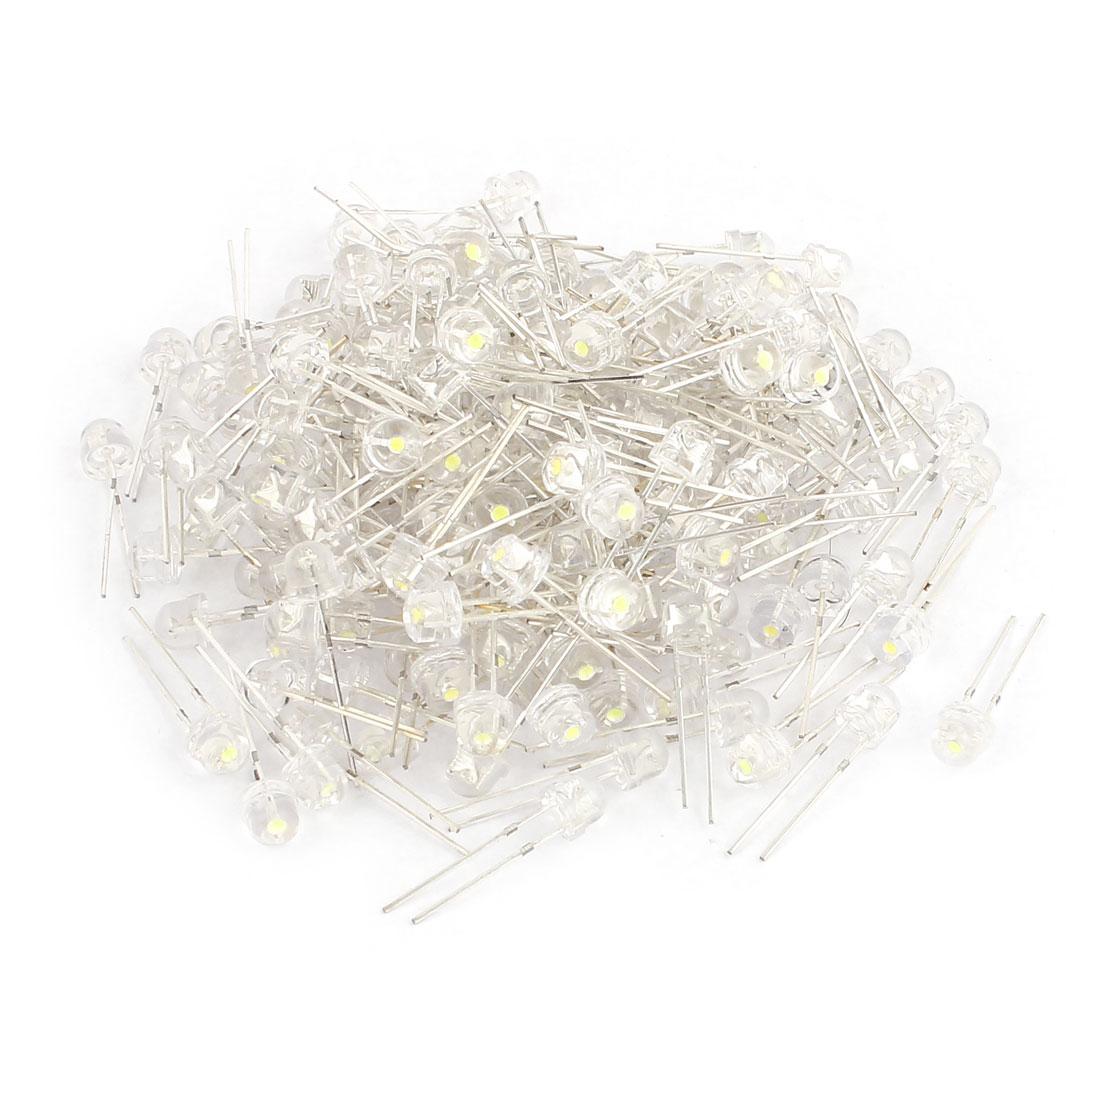 200pcs 5mm Straw Hat White Light LED Emitting Diode Transparent DIY Bulb Beads